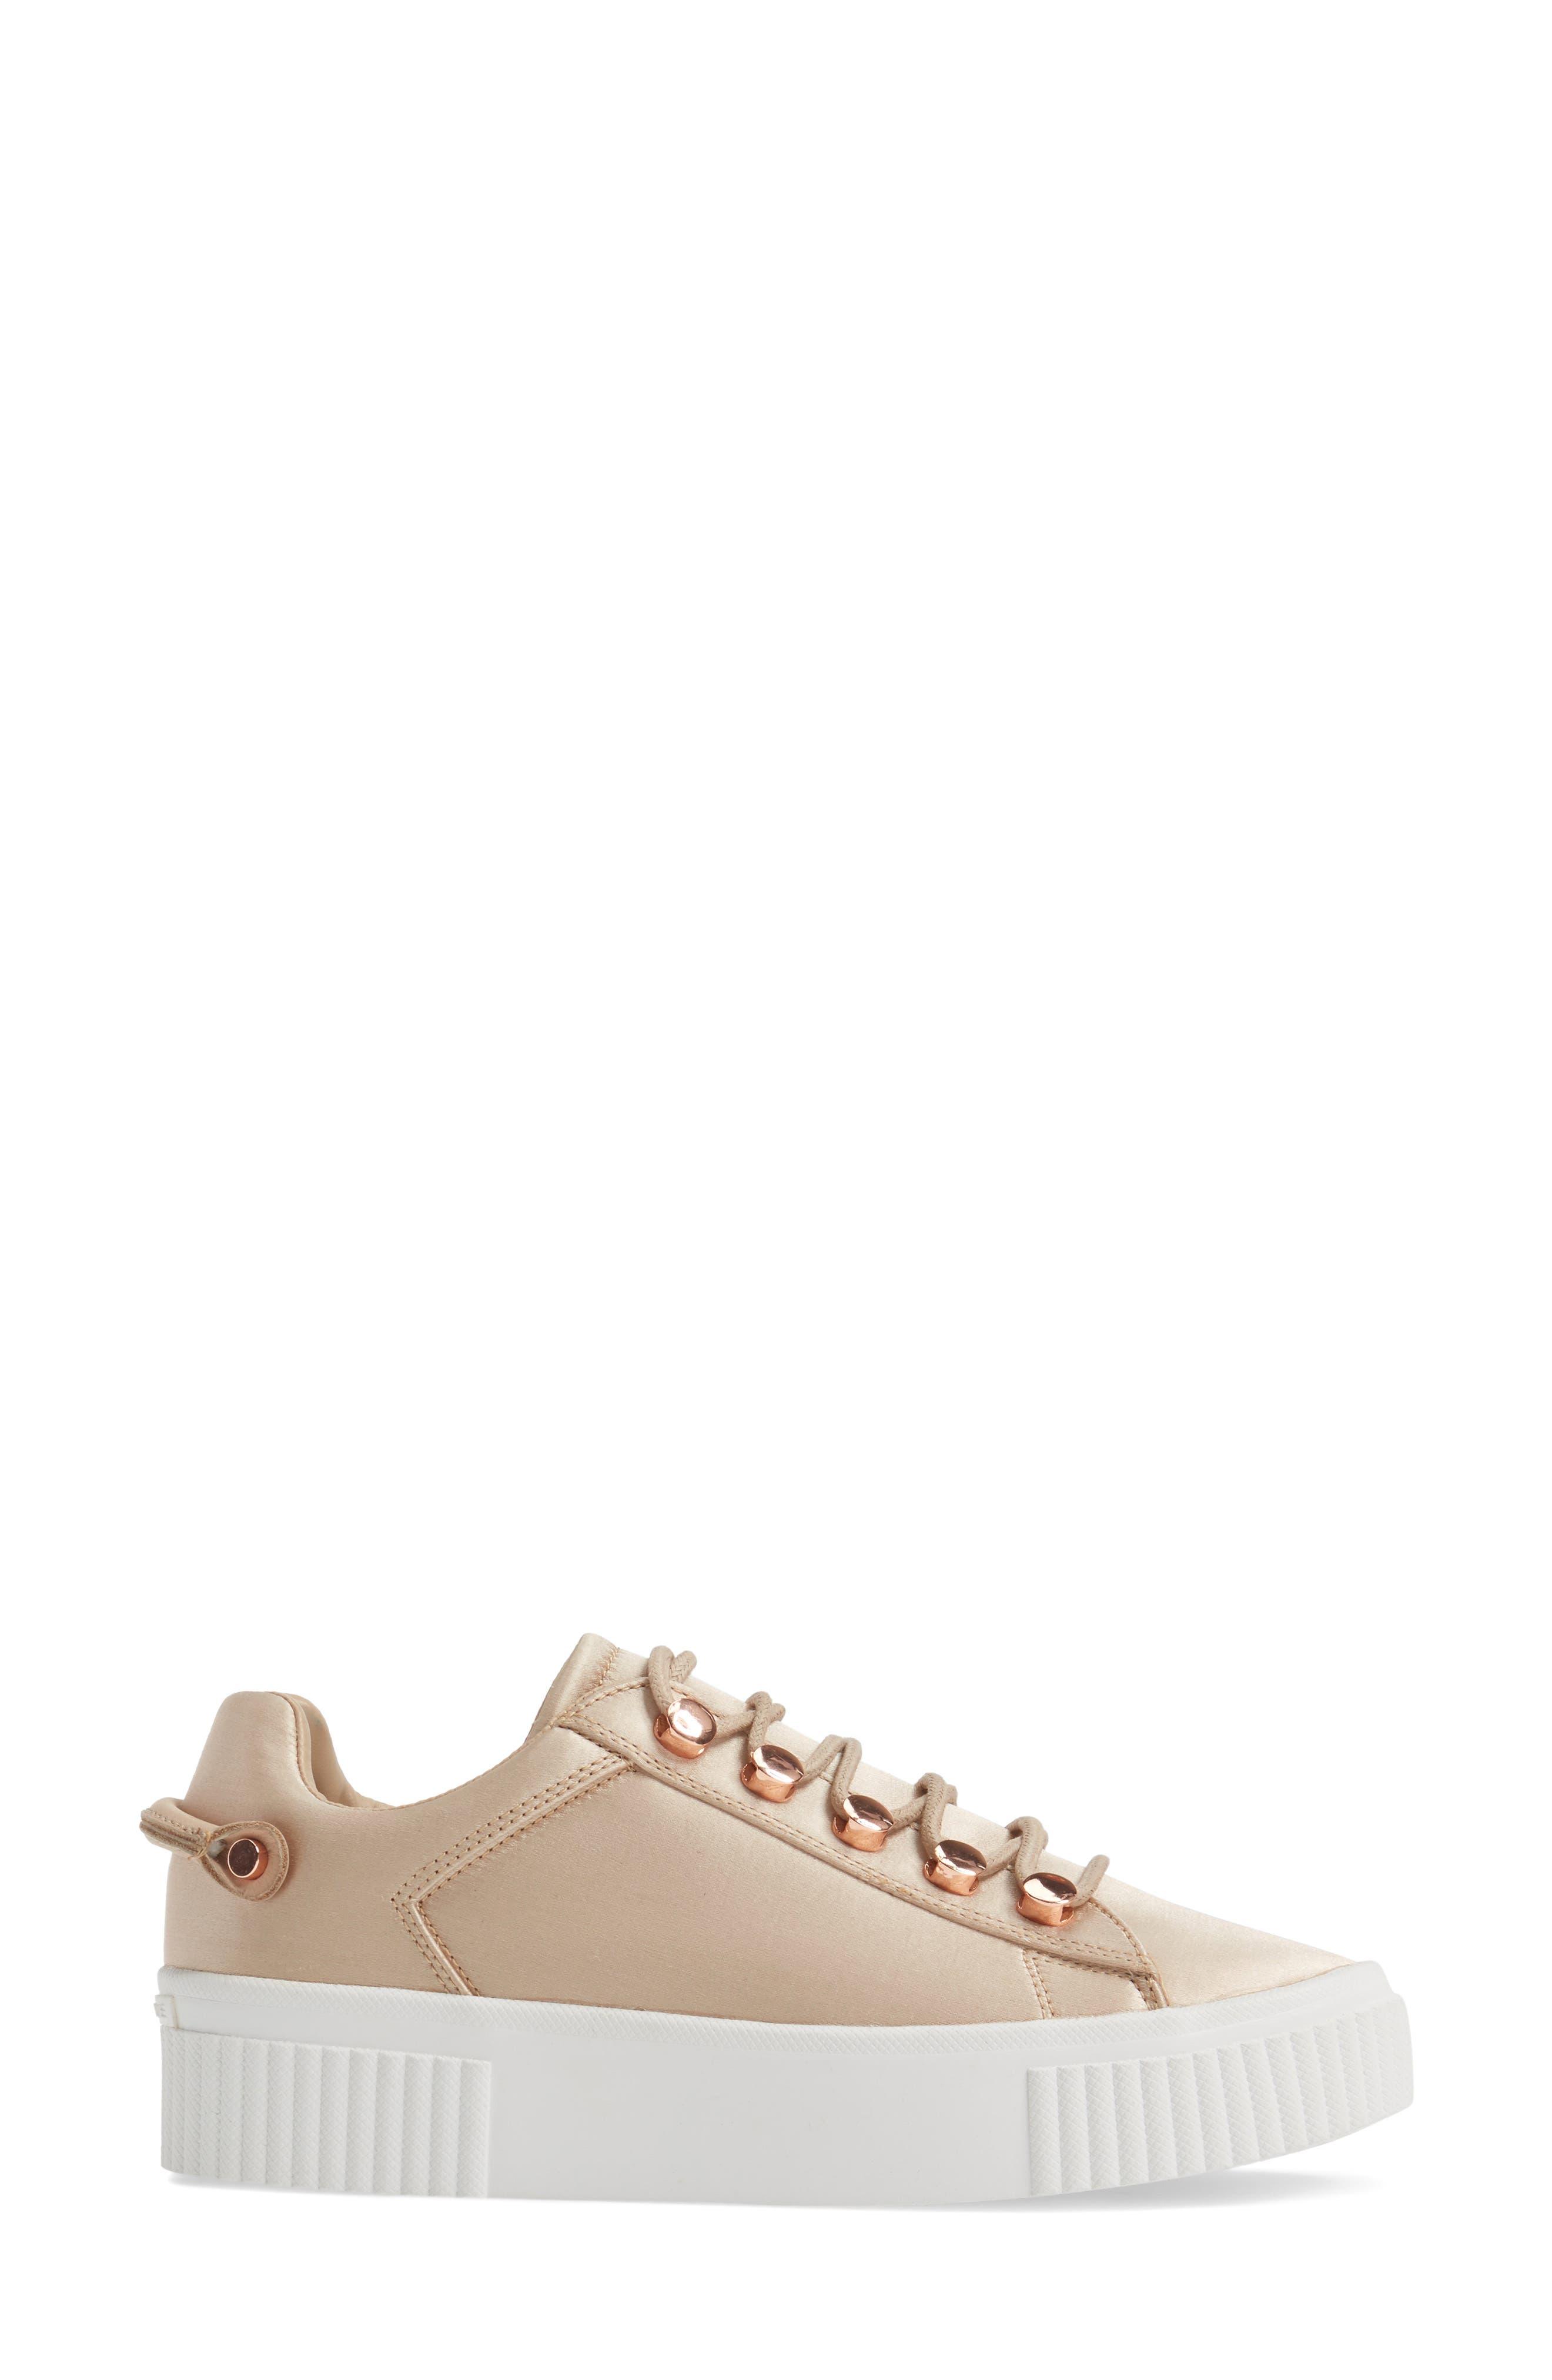 Rae 3 Platform Sneaker,                             Alternate thumbnail 3, color,                             Blush Satin